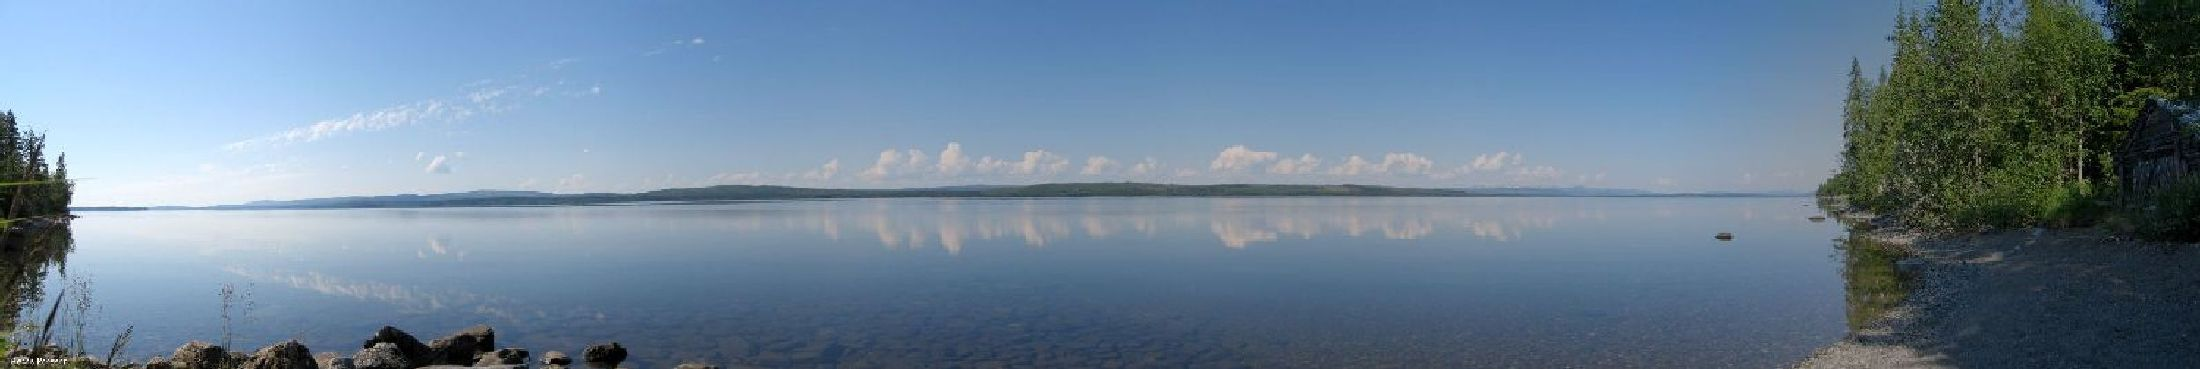 Vy �ver Malgomaj, s�dra Lappland Sweden